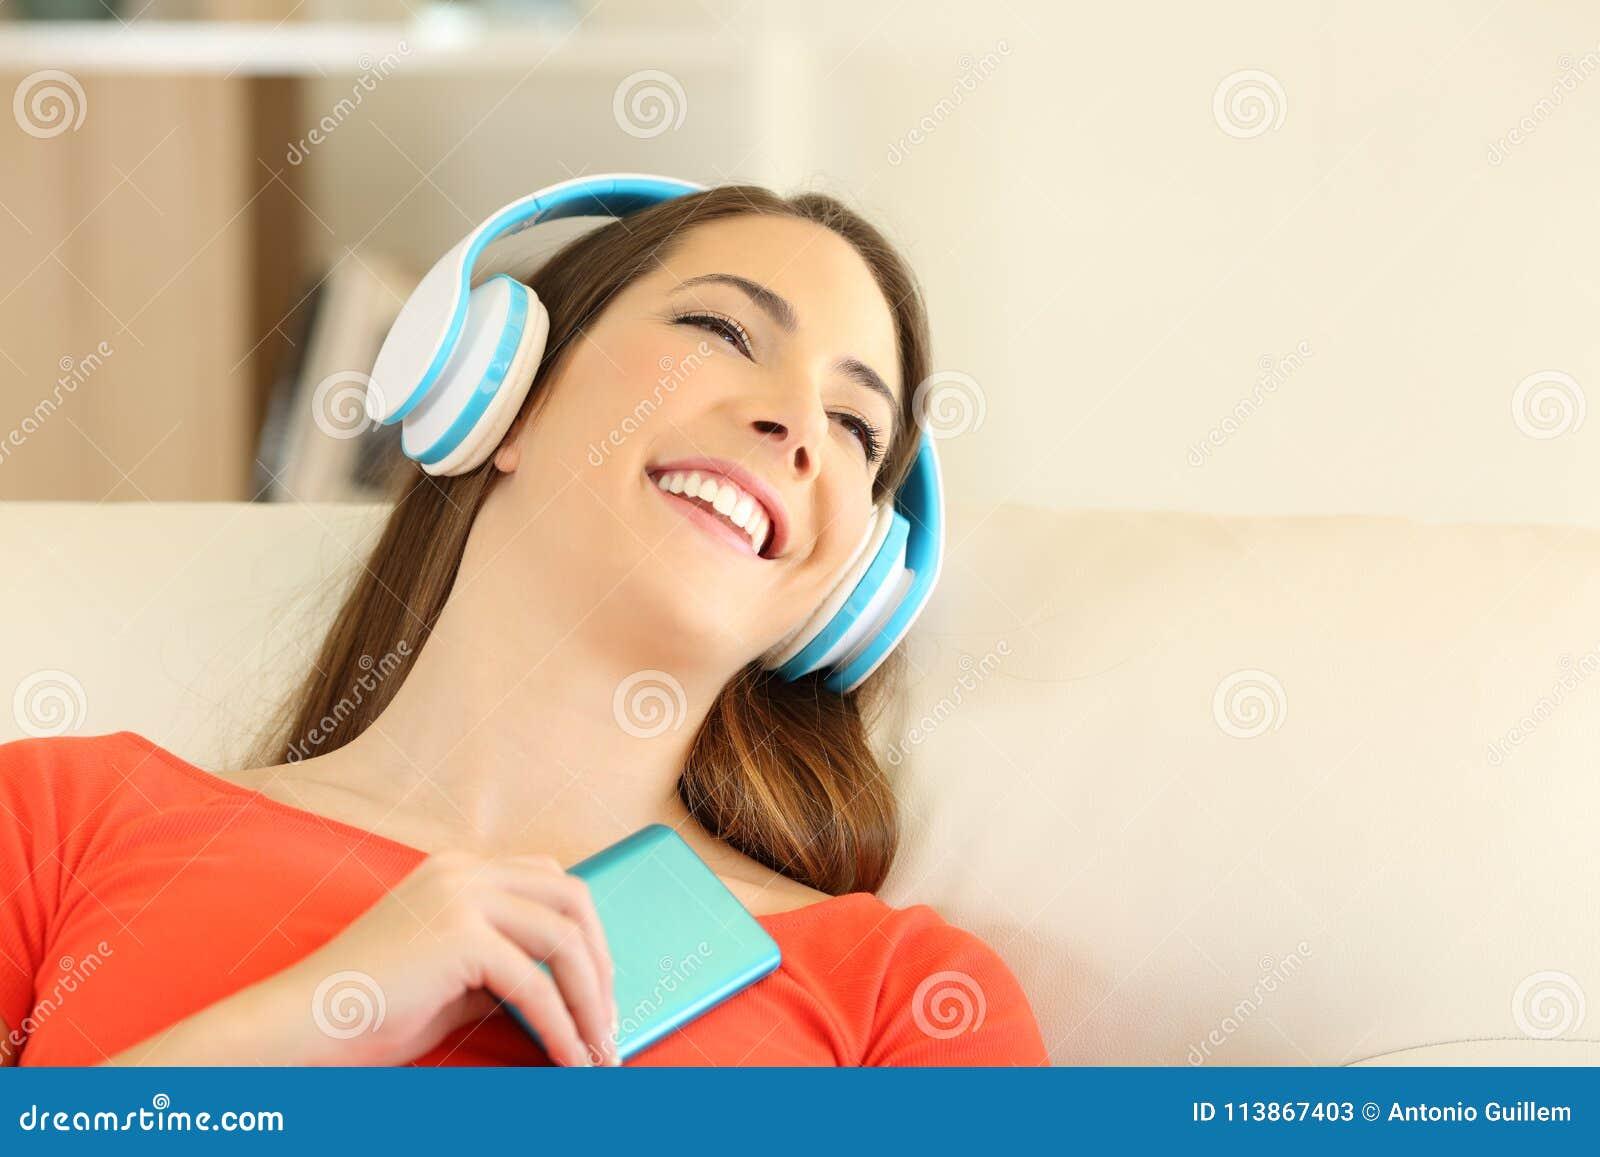 Candid Girl Wearing Headphones Listening To Music Stock Image